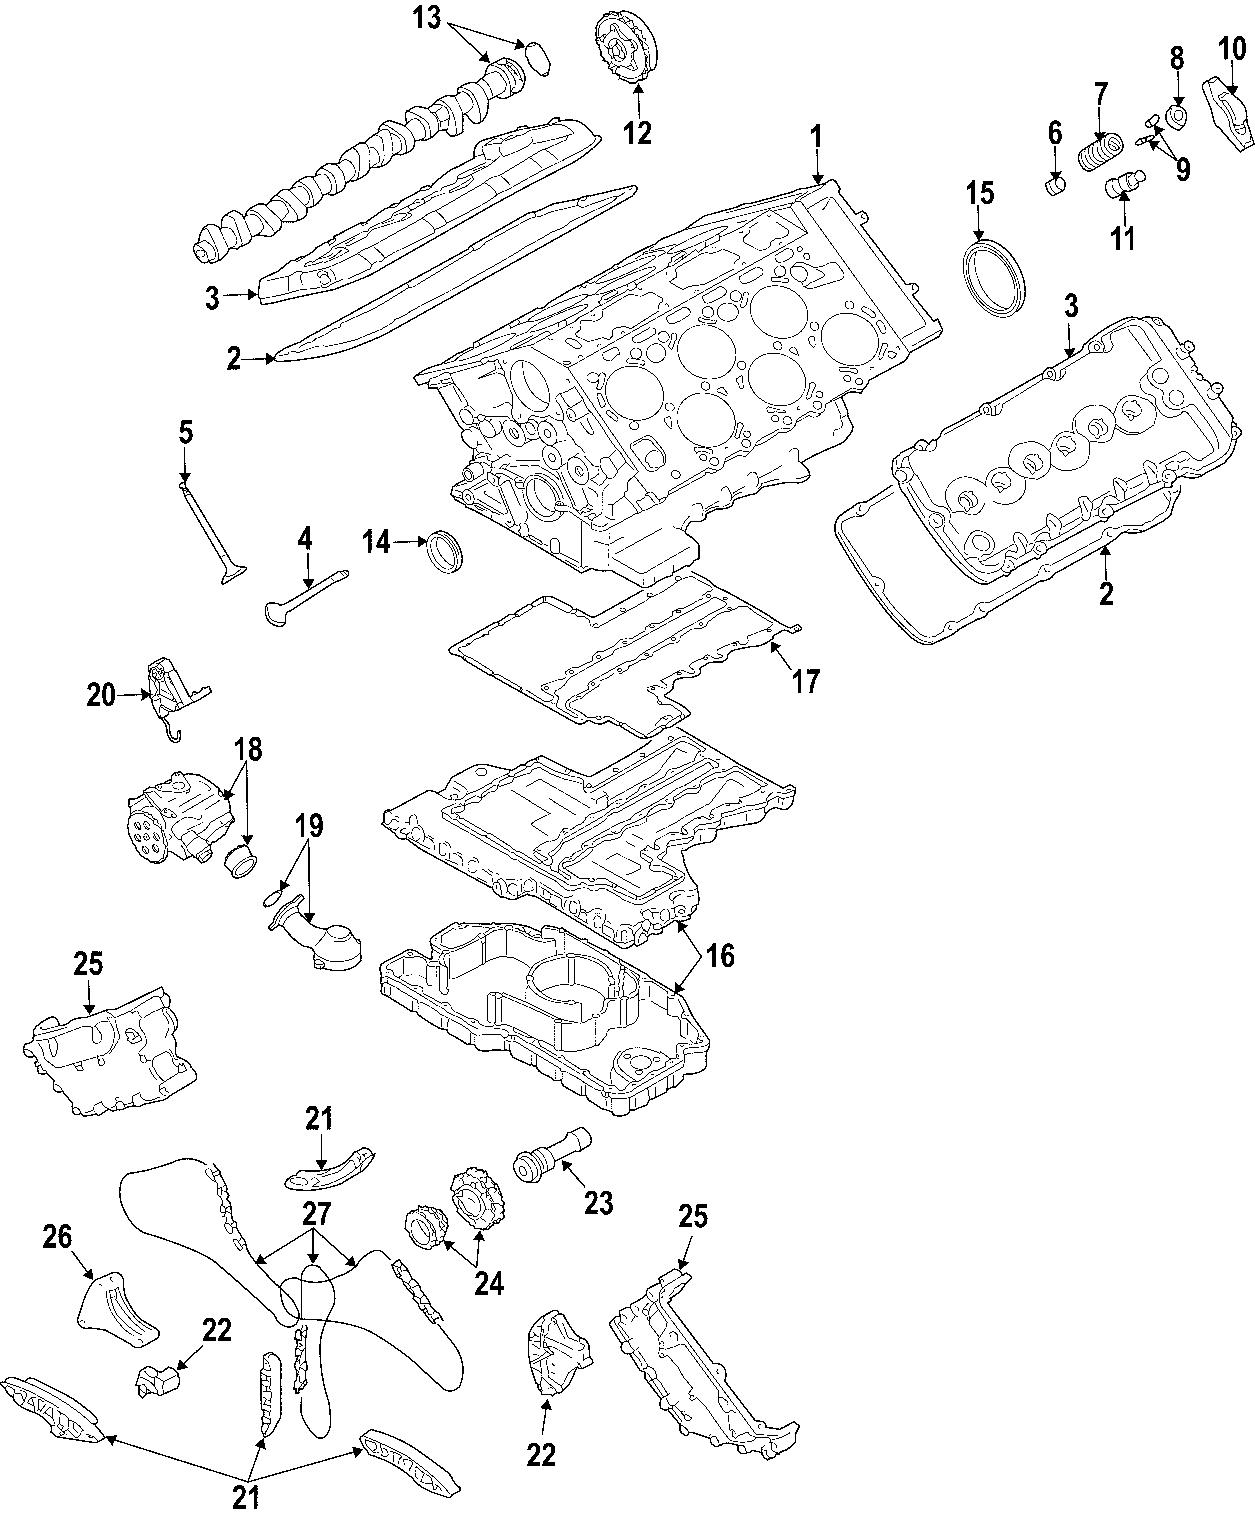 Volkswagen Phaeton Engine Mount Motor Mount Rubb